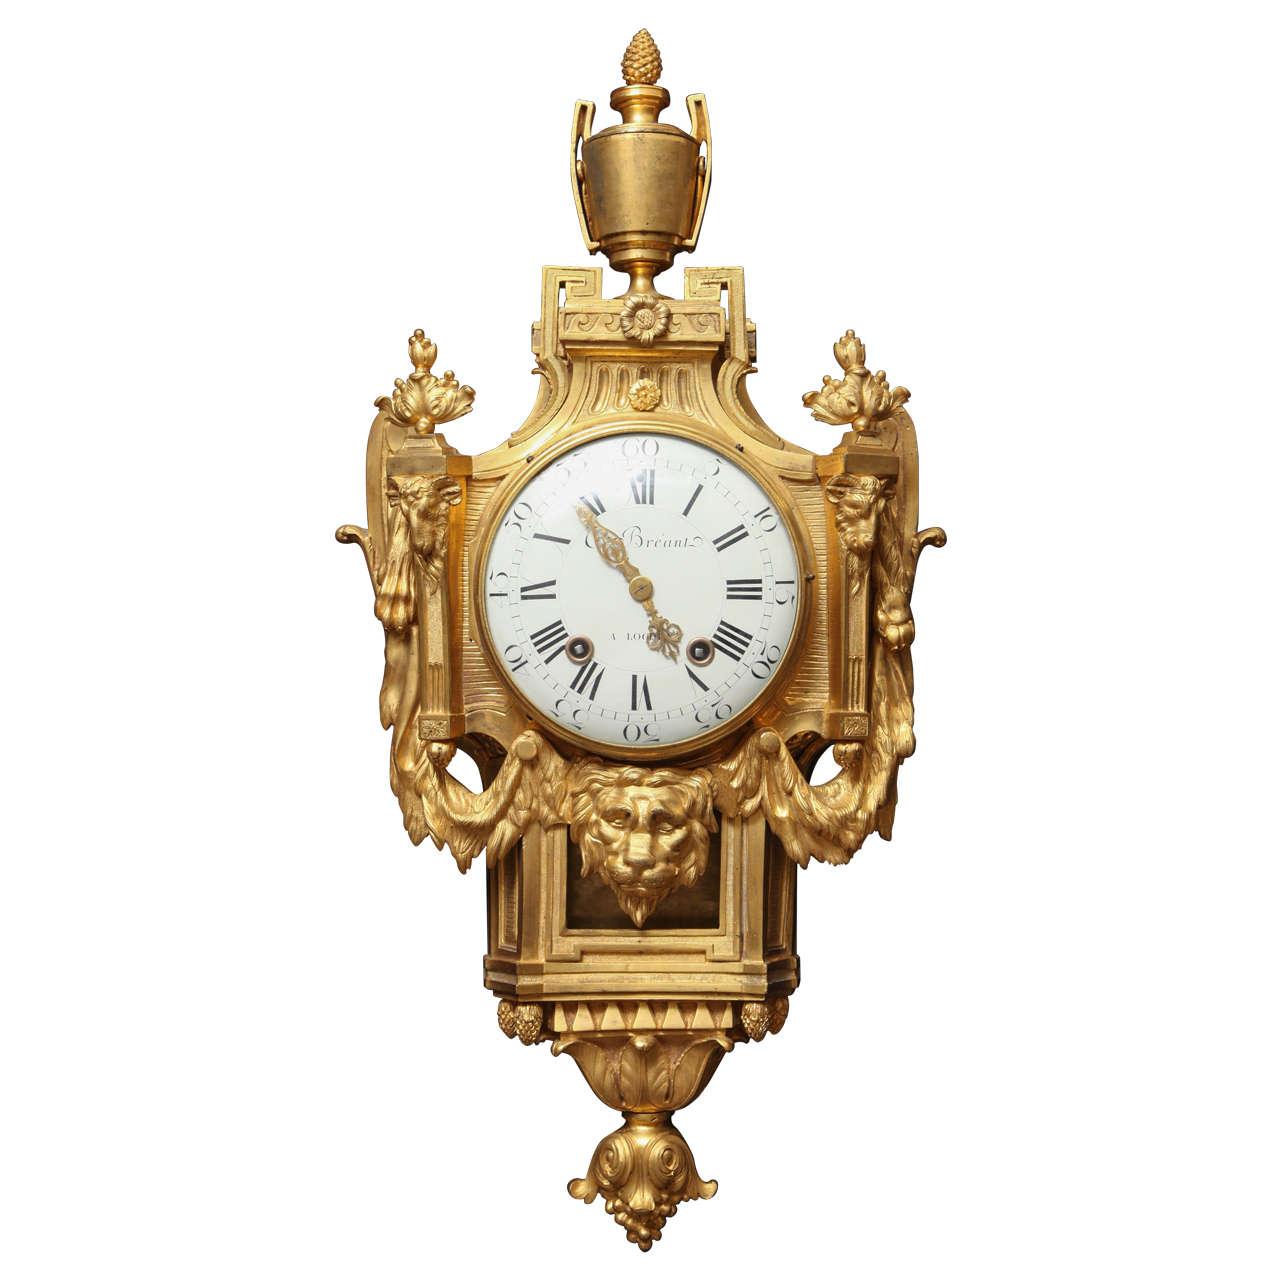 Antique French Louis XVI Period Dore Bronze Striking Cartel Clock, 18th Century For Sale